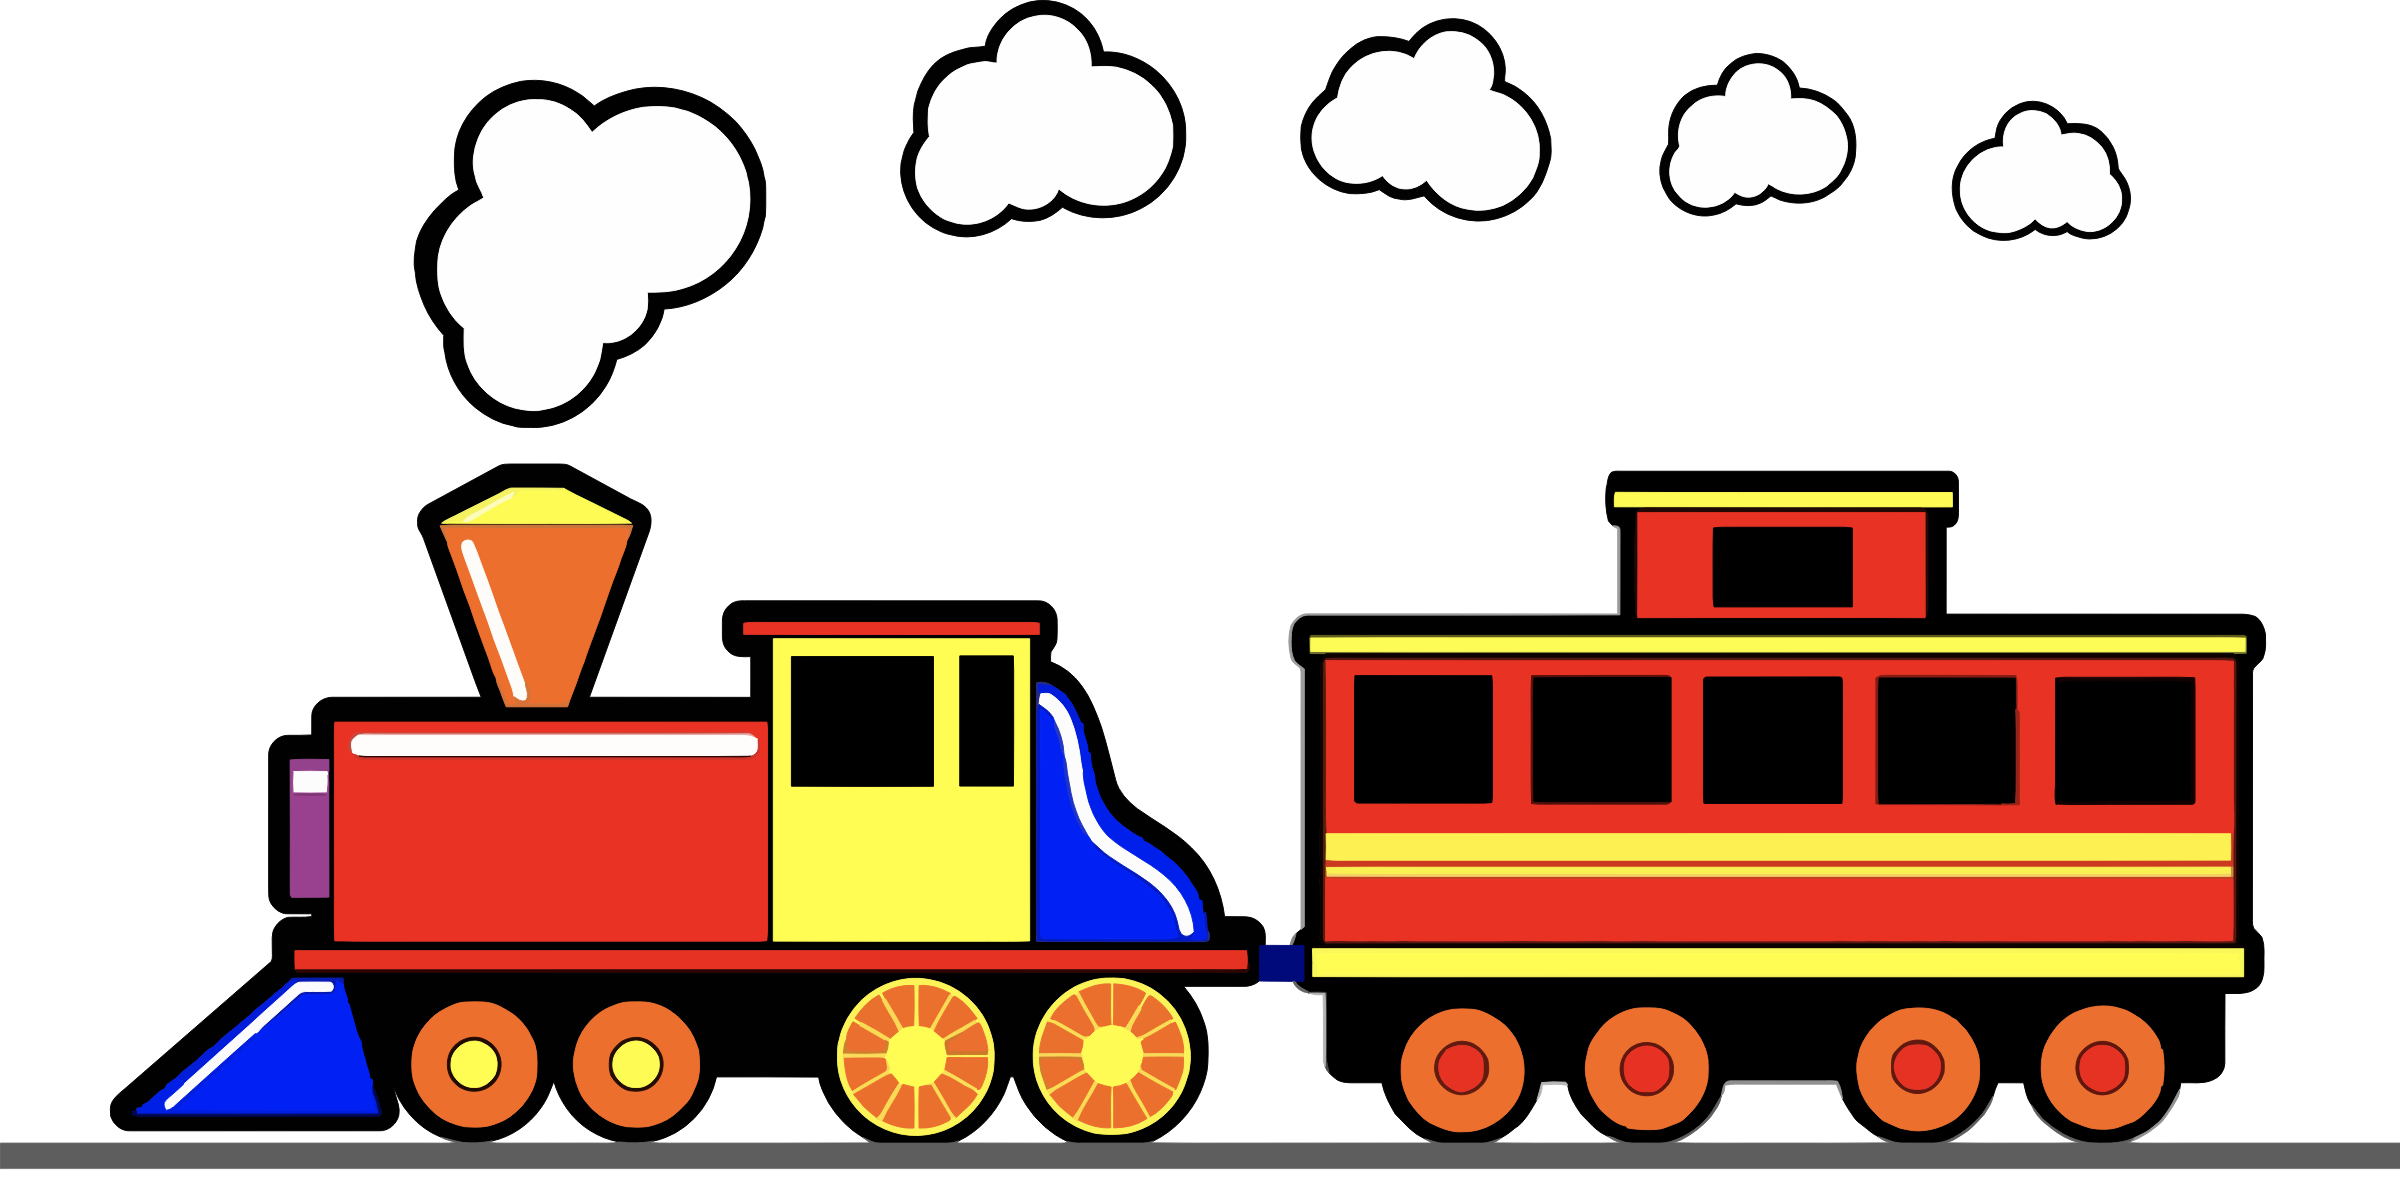 Train image clipart picture free Train Clipart to download free – Free Clipart Images picture free